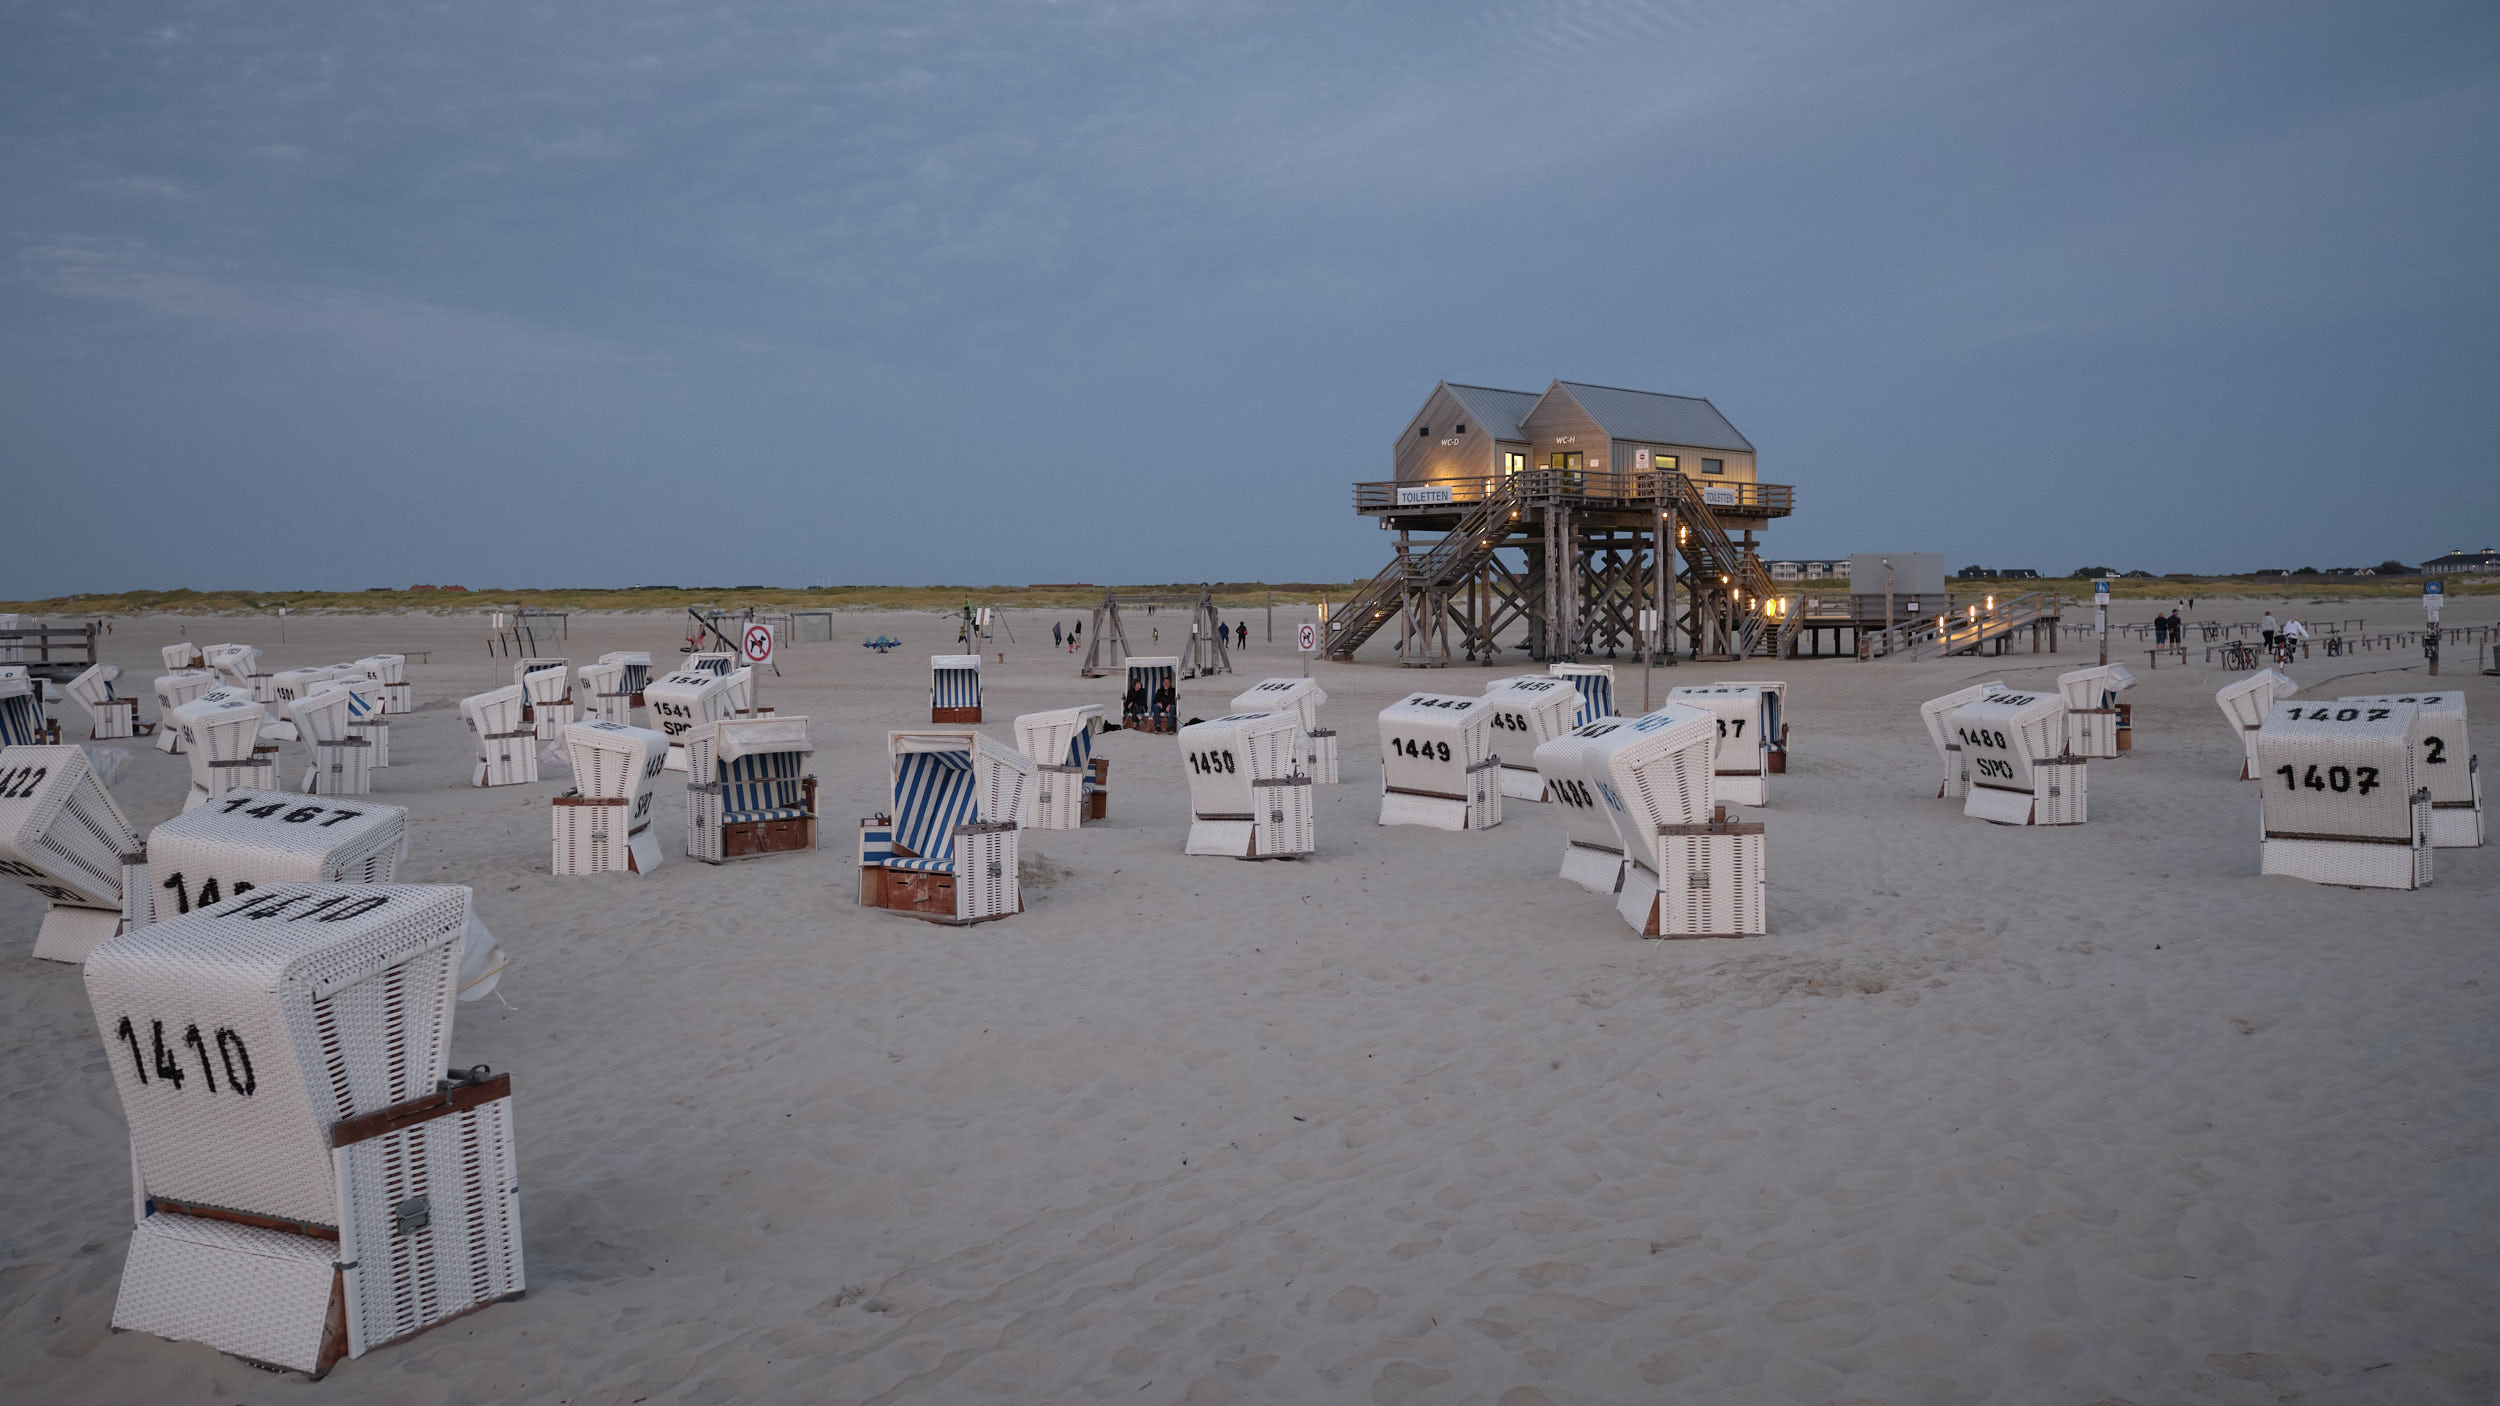 bekannter weiter Sandstrand in Sankt-Peter-Ording